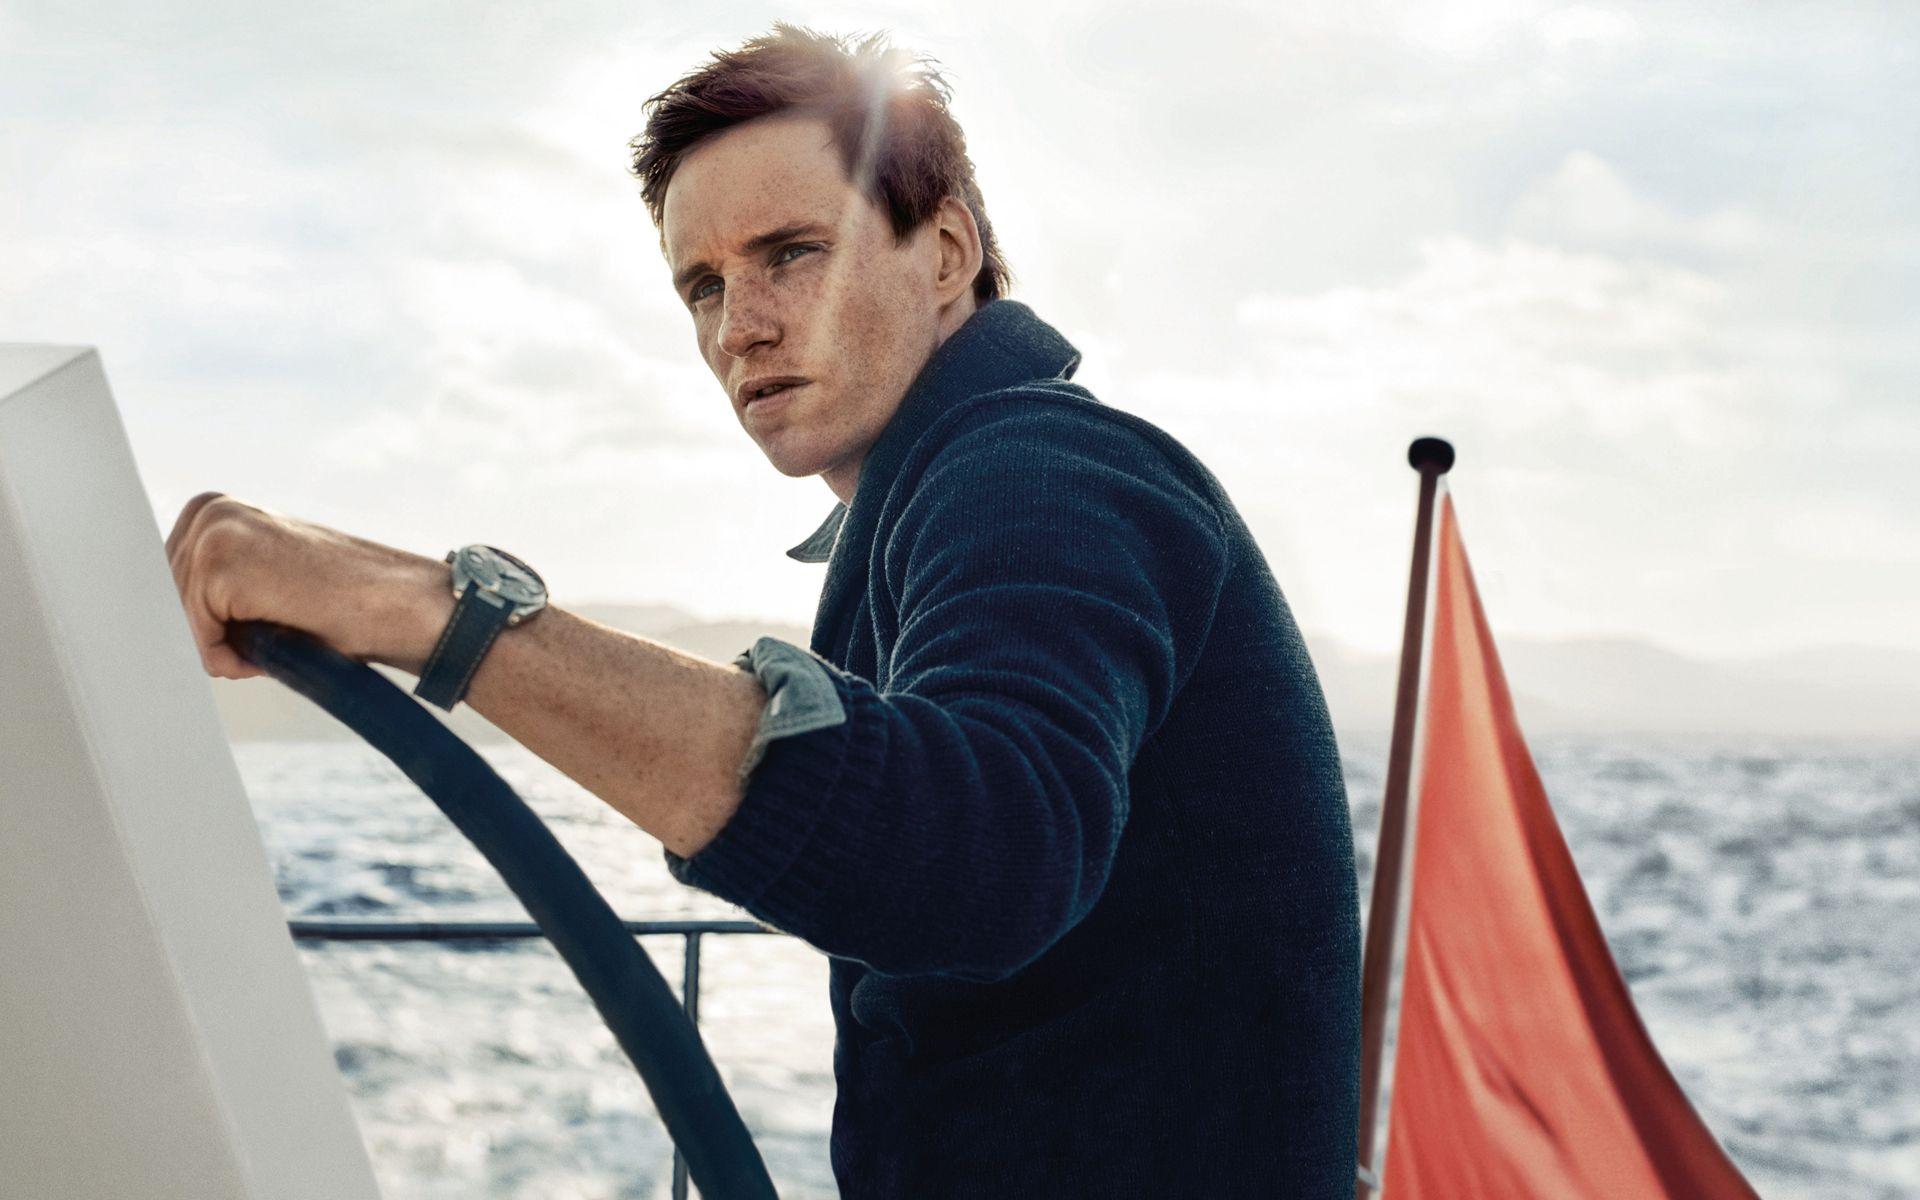 Omega Seamaster Aqua Terra: The Perfect Balance Between Sophistication And Ocean Spirit